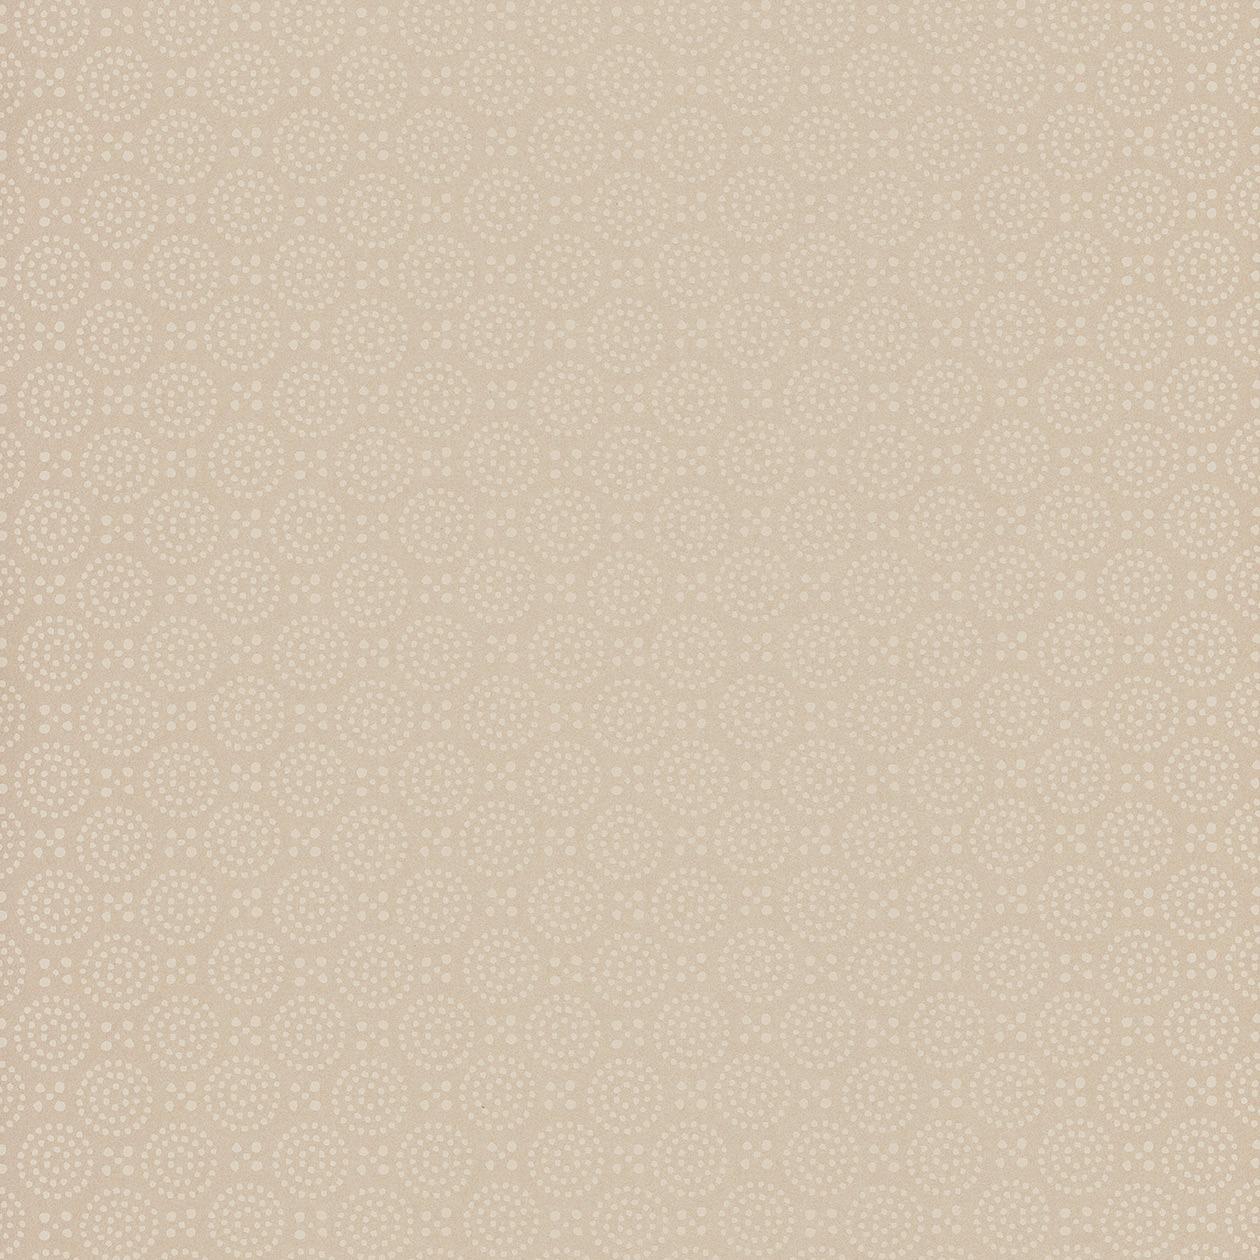 Французские обои Caselio,  коллекция Trio, артикулTIO68041010